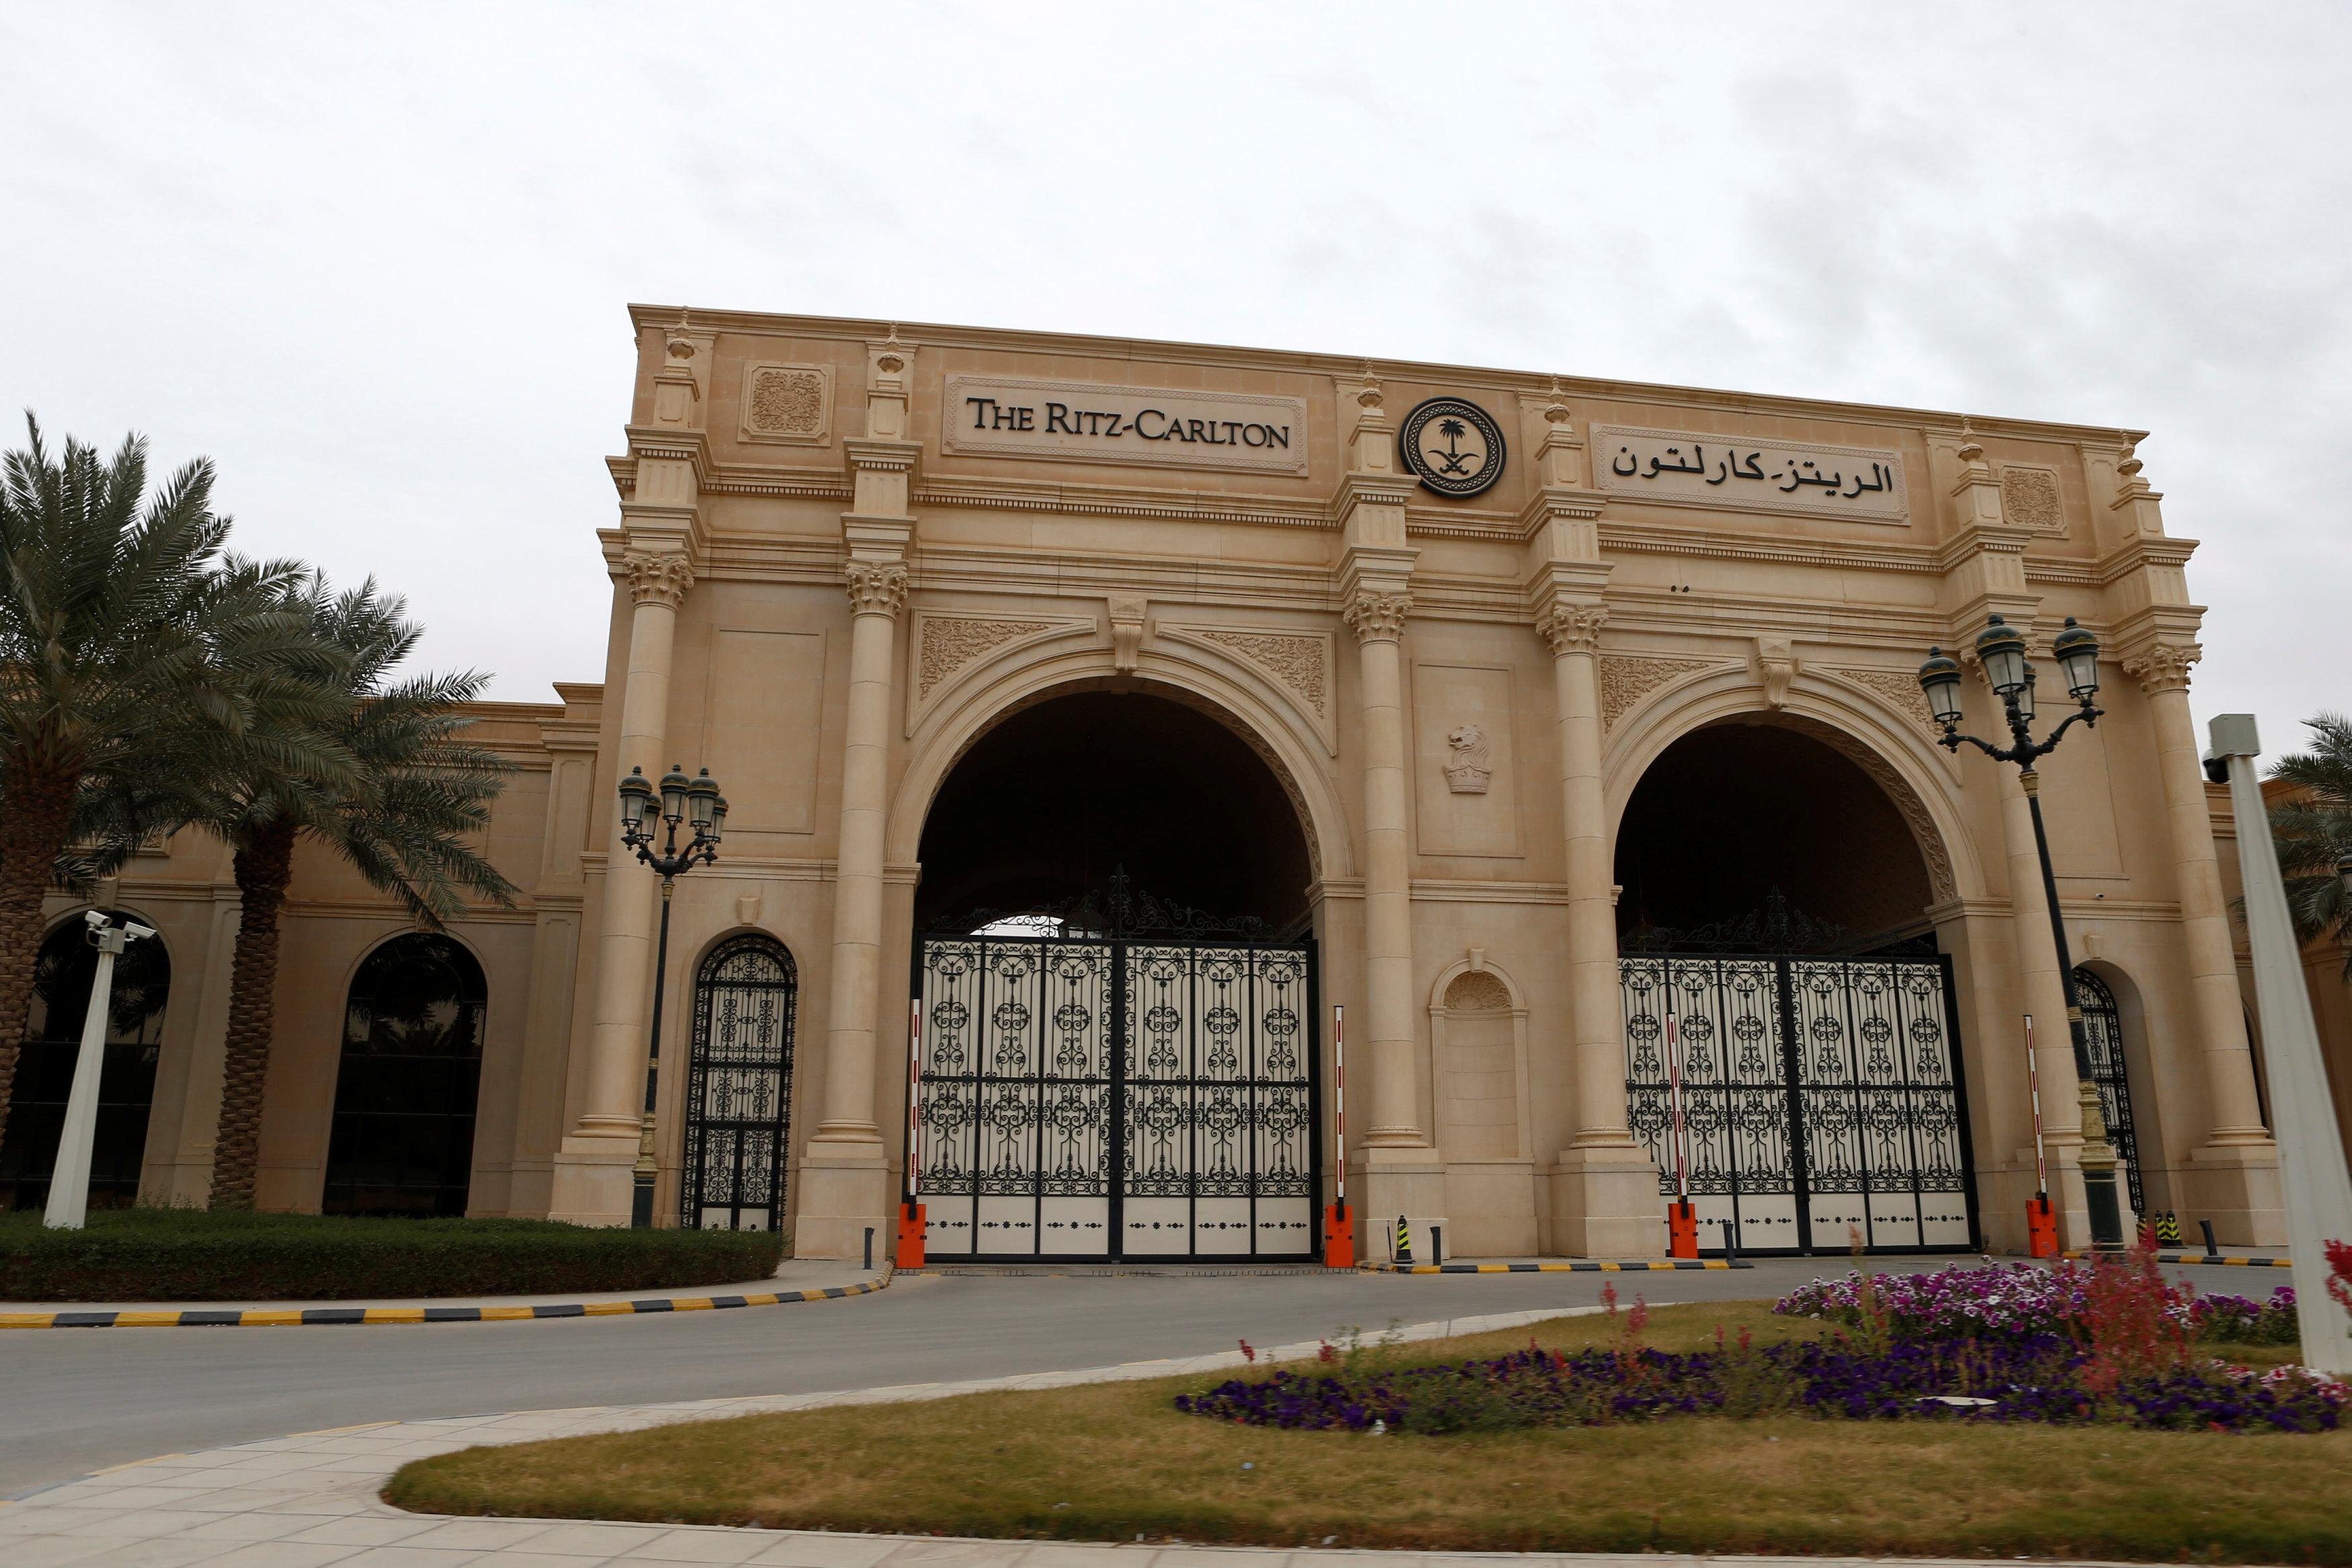 A view shows the Ritz-Carlton hotel's entrance gate in the diplomatic quarter of Riyadh, Saudi Arabia, January 30, 2018.